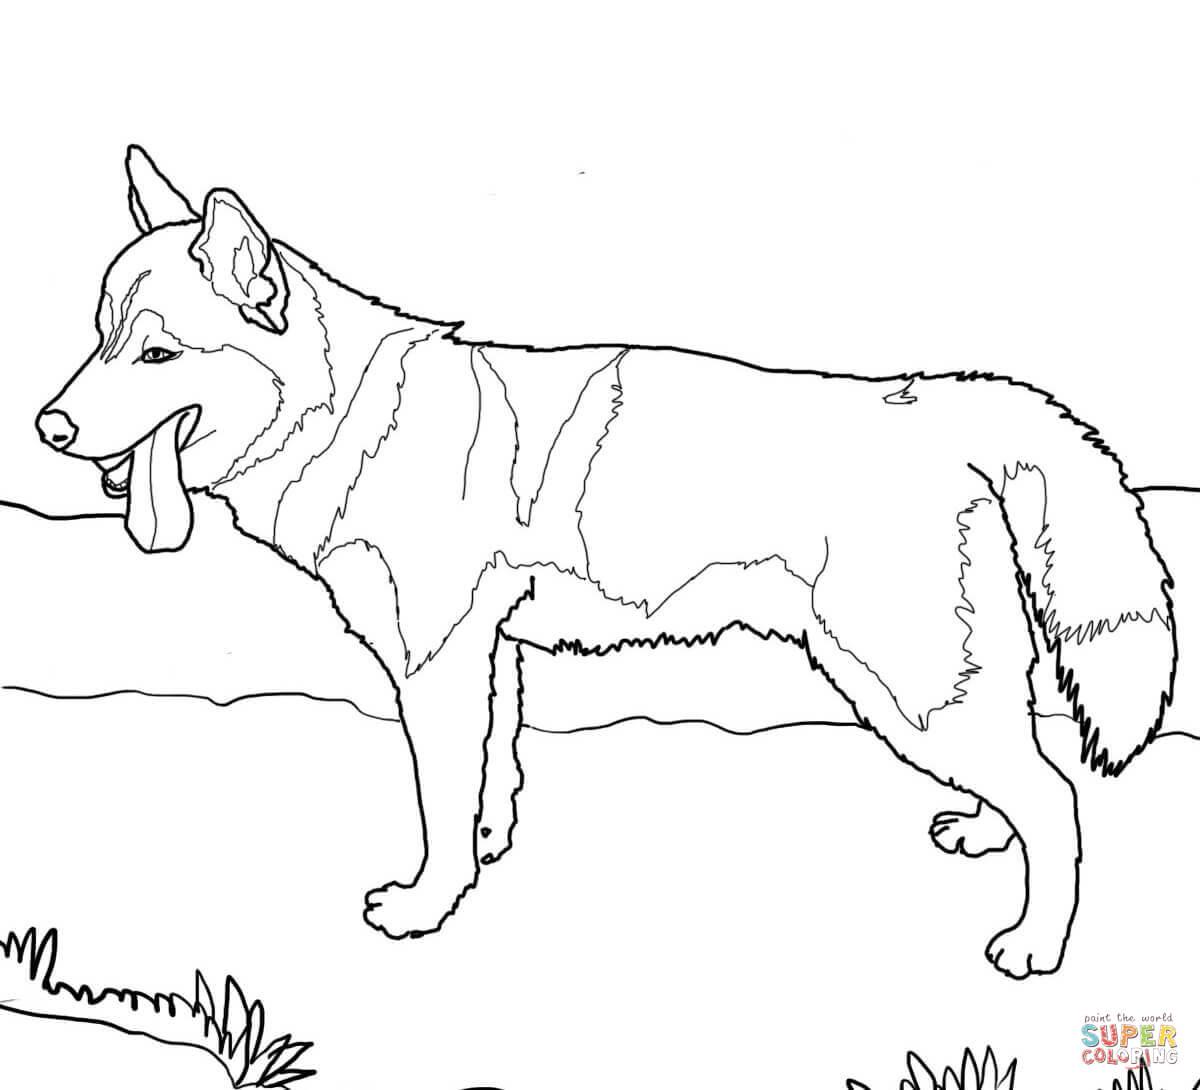 German Shepherd Dogs Coloring Page Free Printable Coloring Pages - Free Printable Dog Coloring Pages